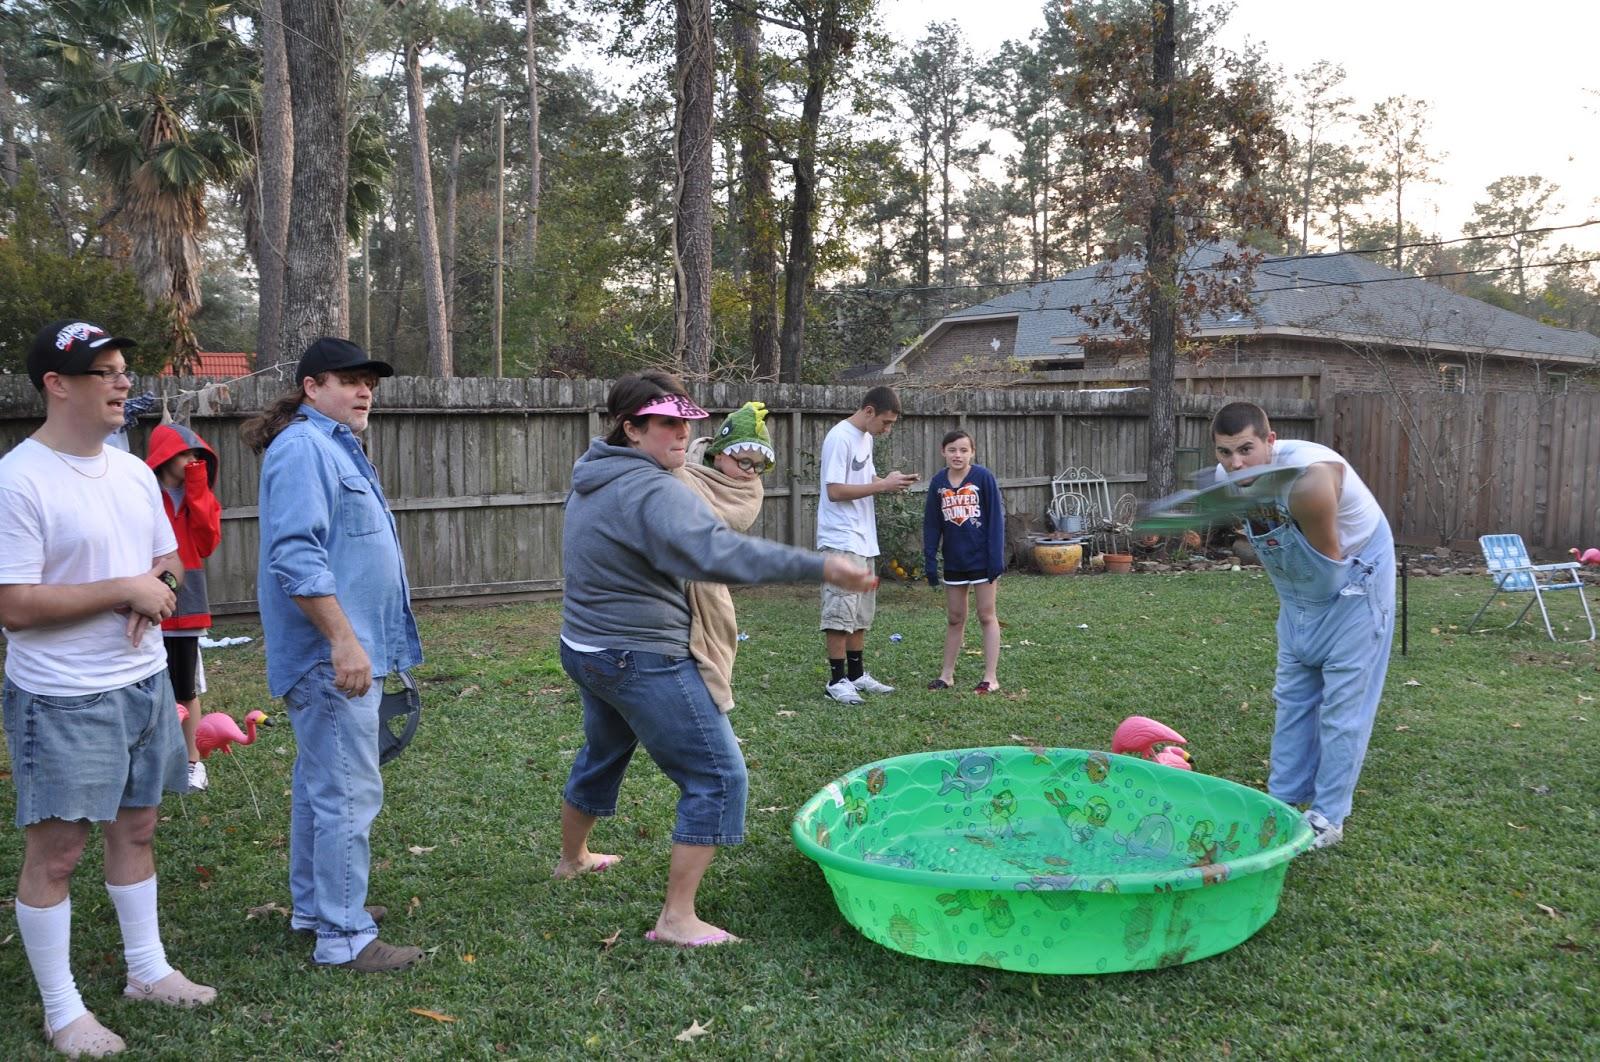 Horseshoes Backyard Games